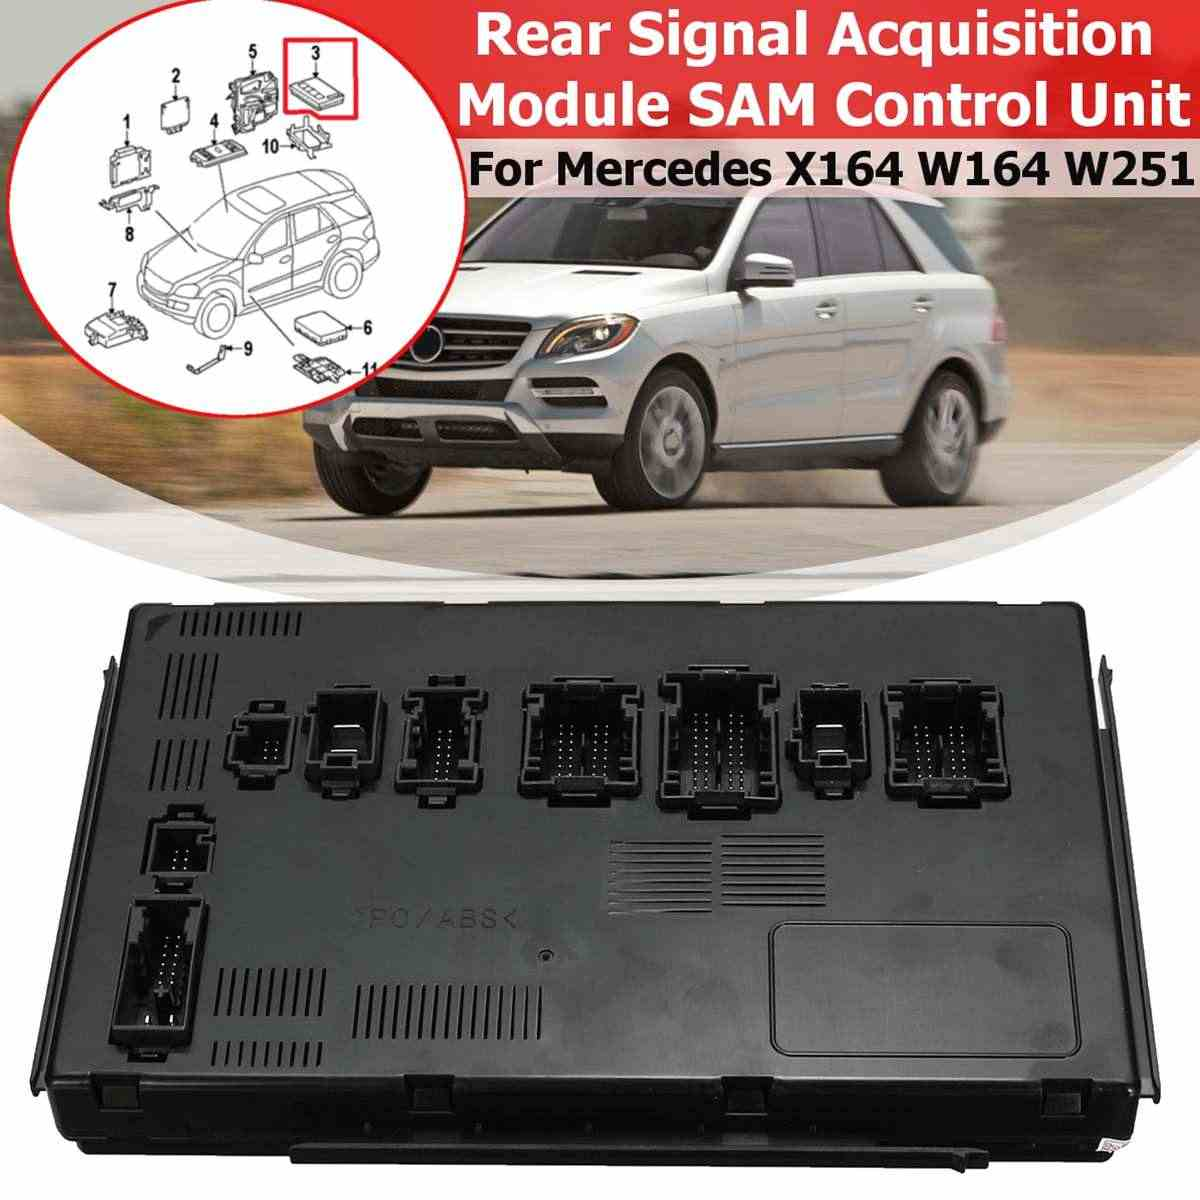 1pcs for mercedes benz x164 w164 w251 gl320 gl350 rear signal acquisition module sam control [ 1200 x 1200 Pixel ]